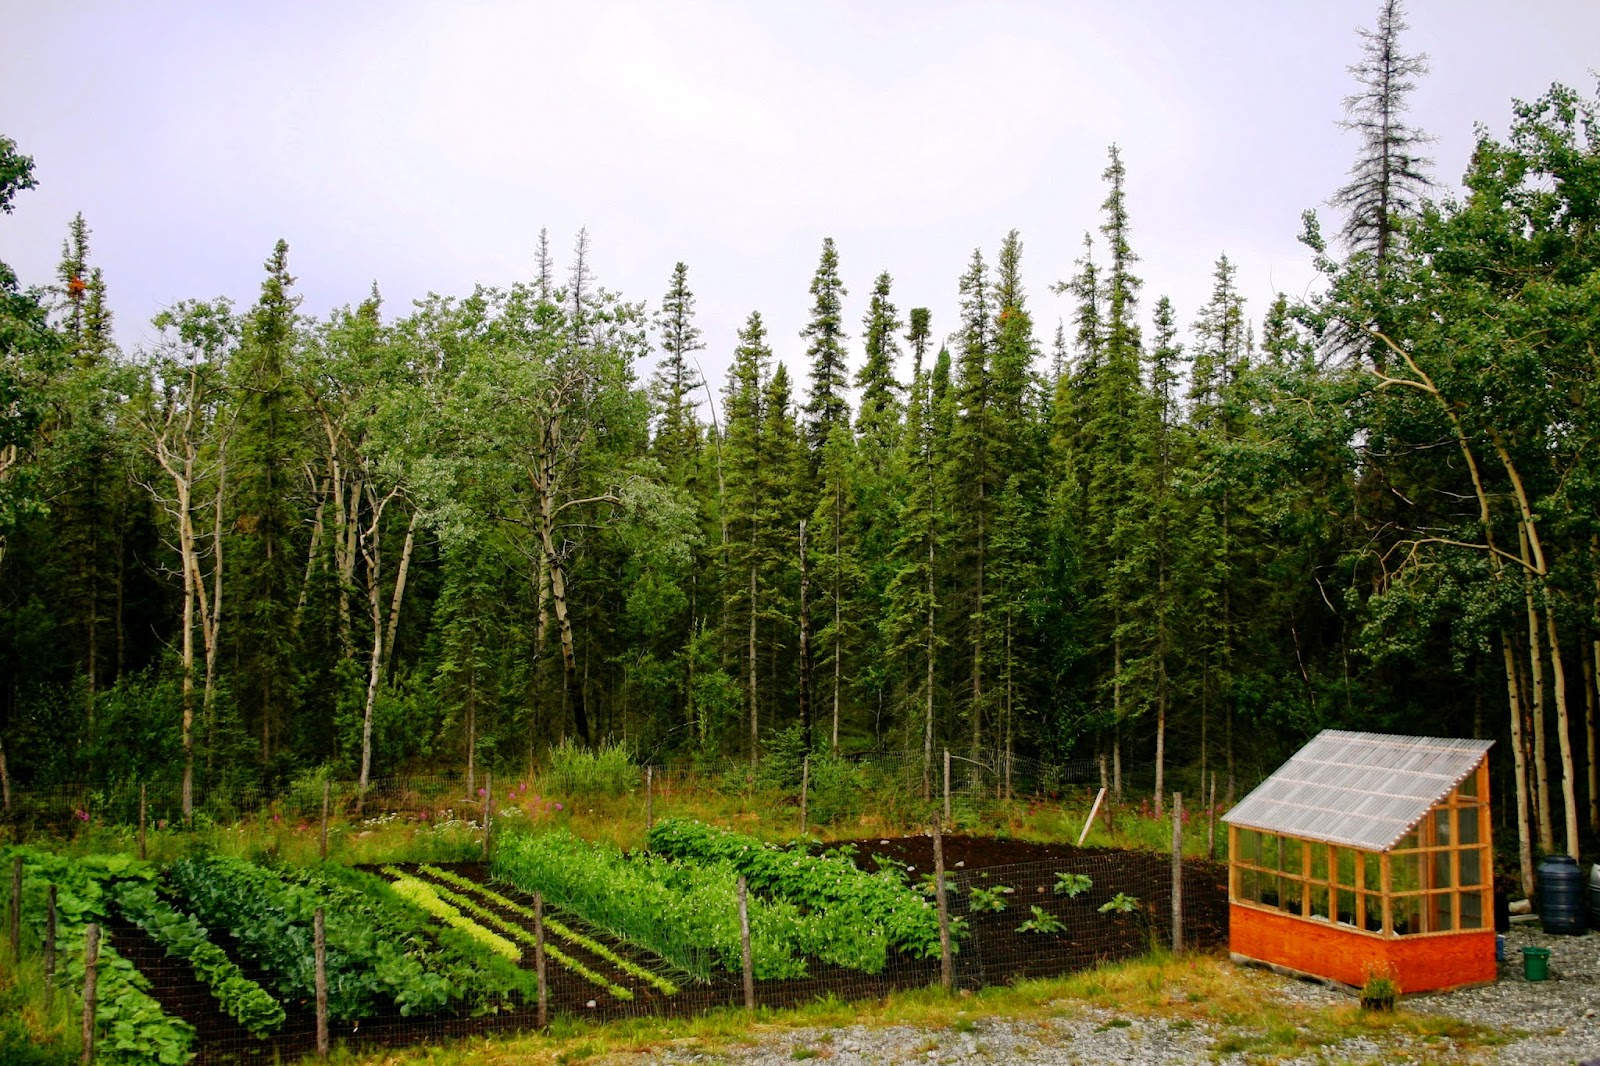 Neil Hannan's rural Alaska homestead.